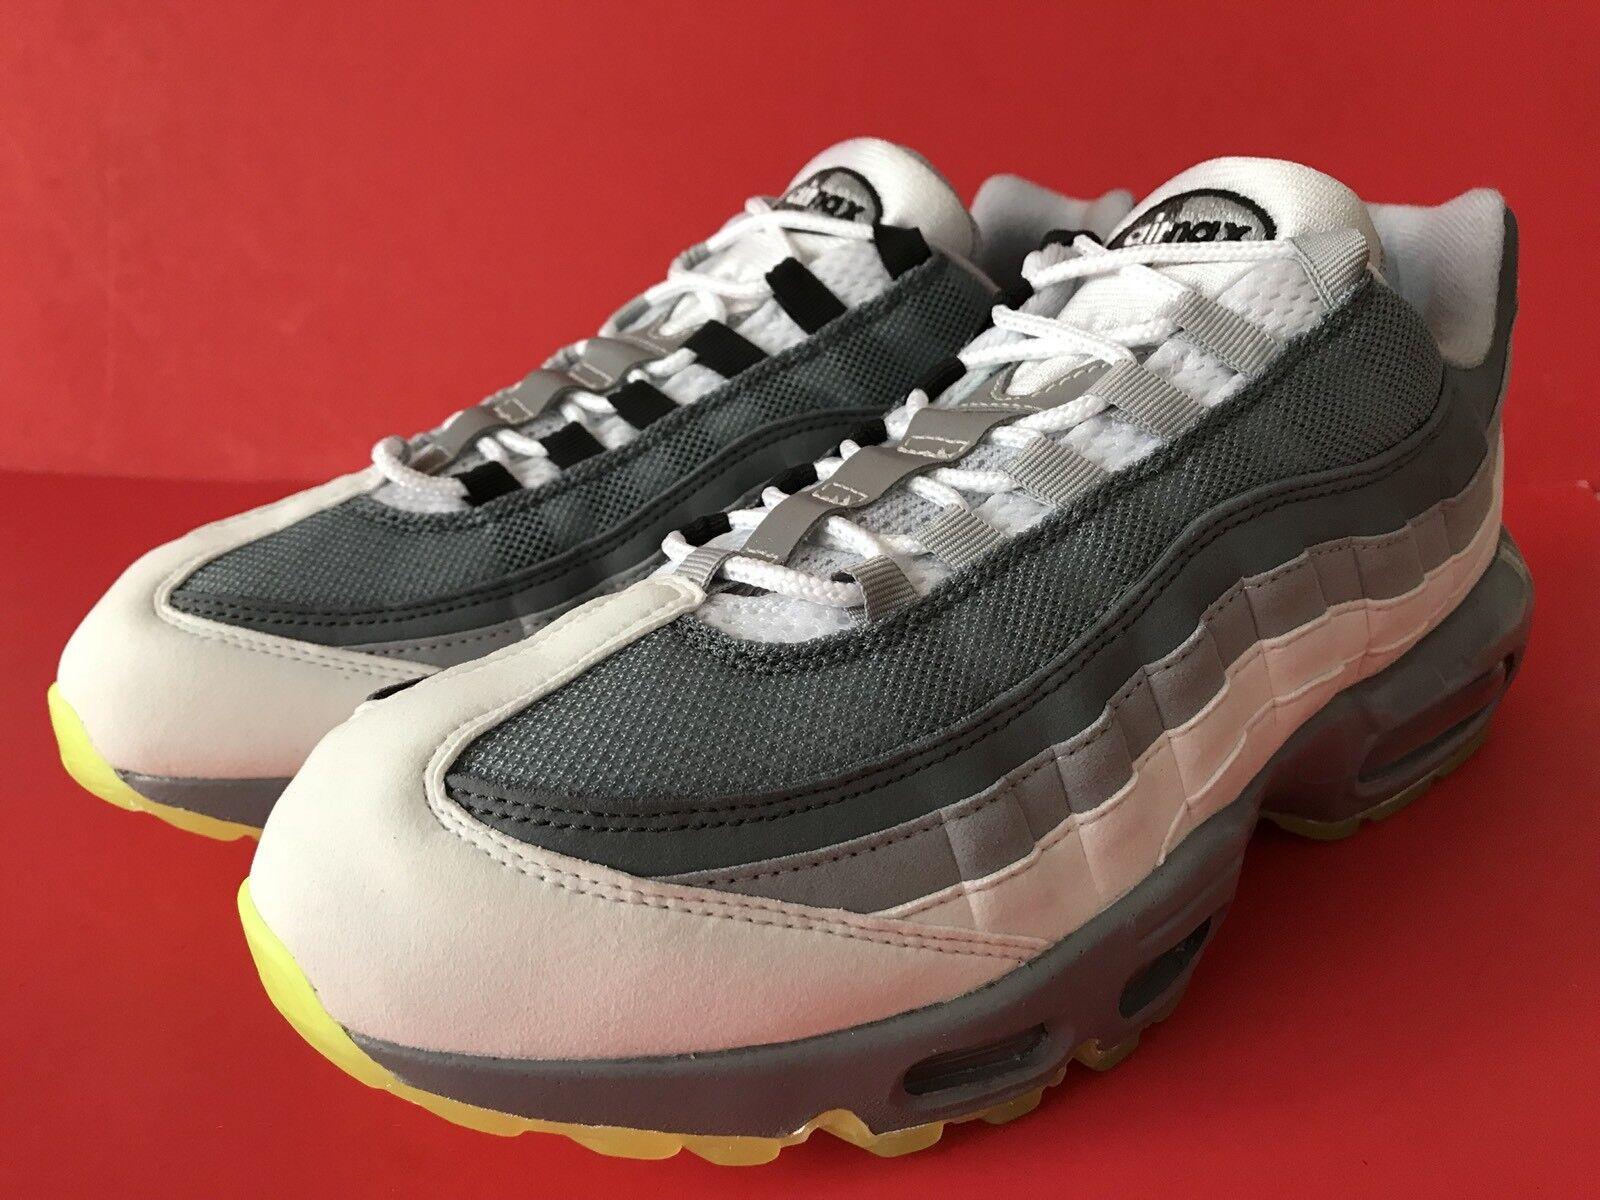 meilleure sélection 72403 3caa0 95 Max Nike ID Air Men 10 Size 996 818592 4921cugjg21296 ...